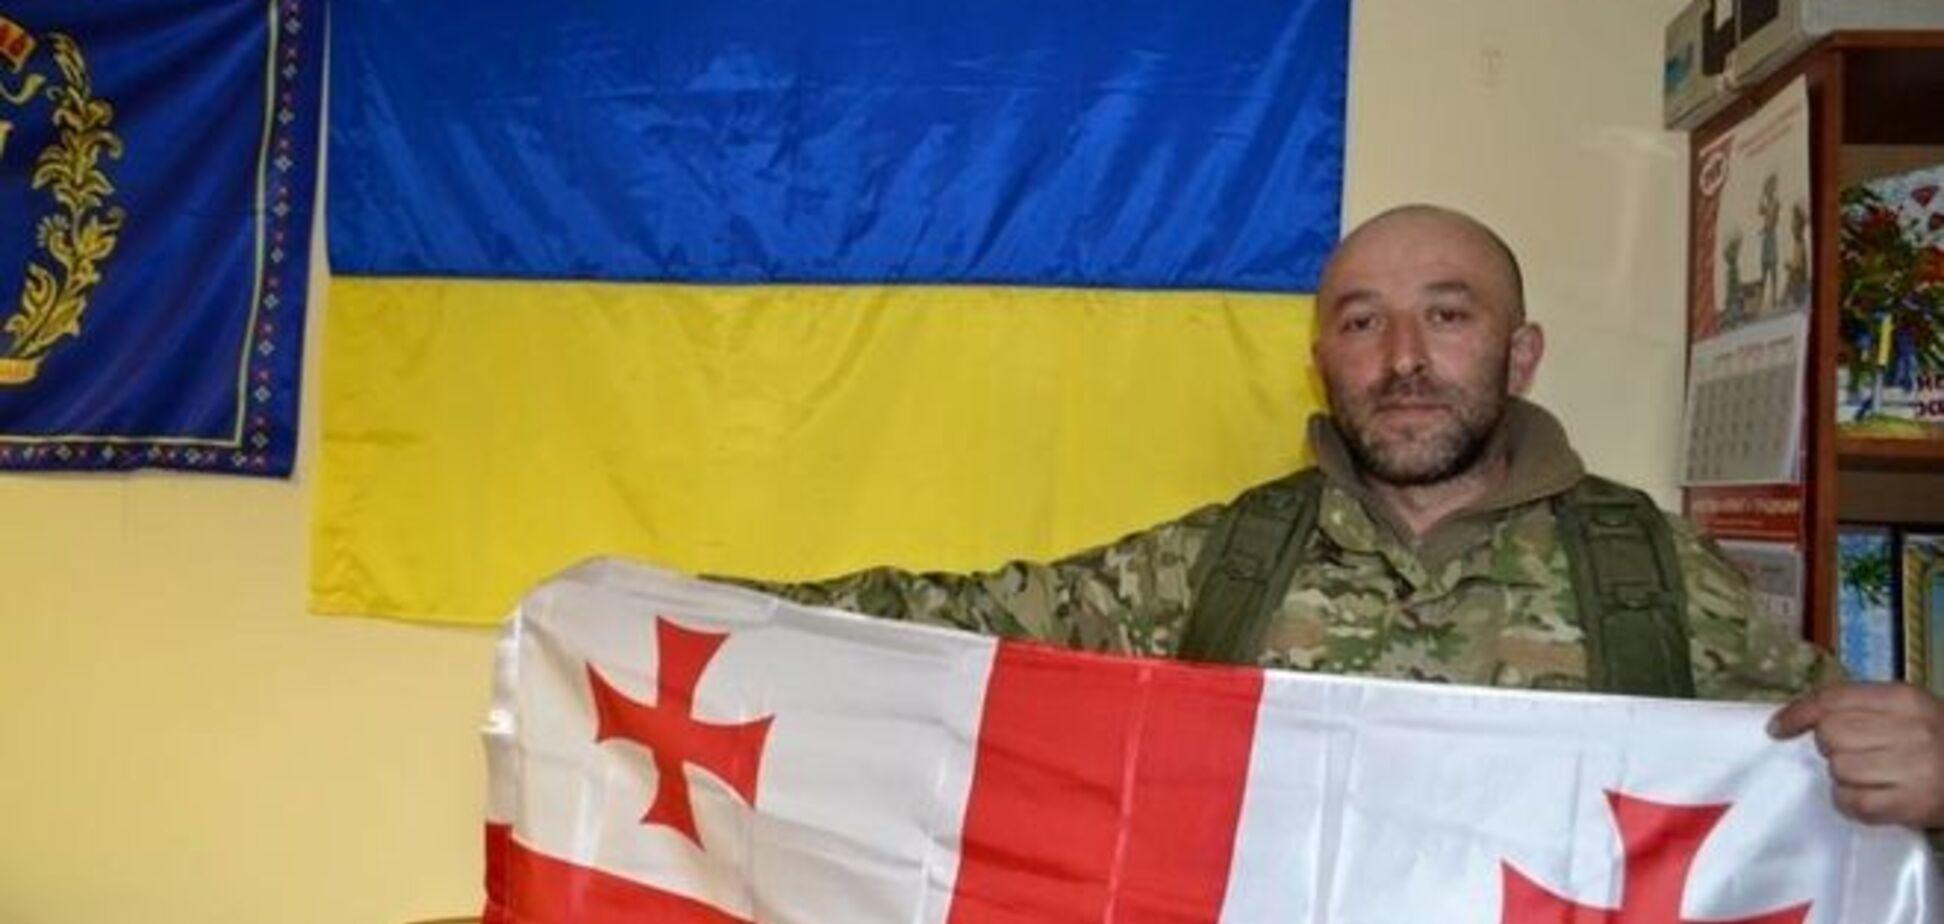 В бою под Широкино погиб грузинский боец 'Сатана': последнее видео героя